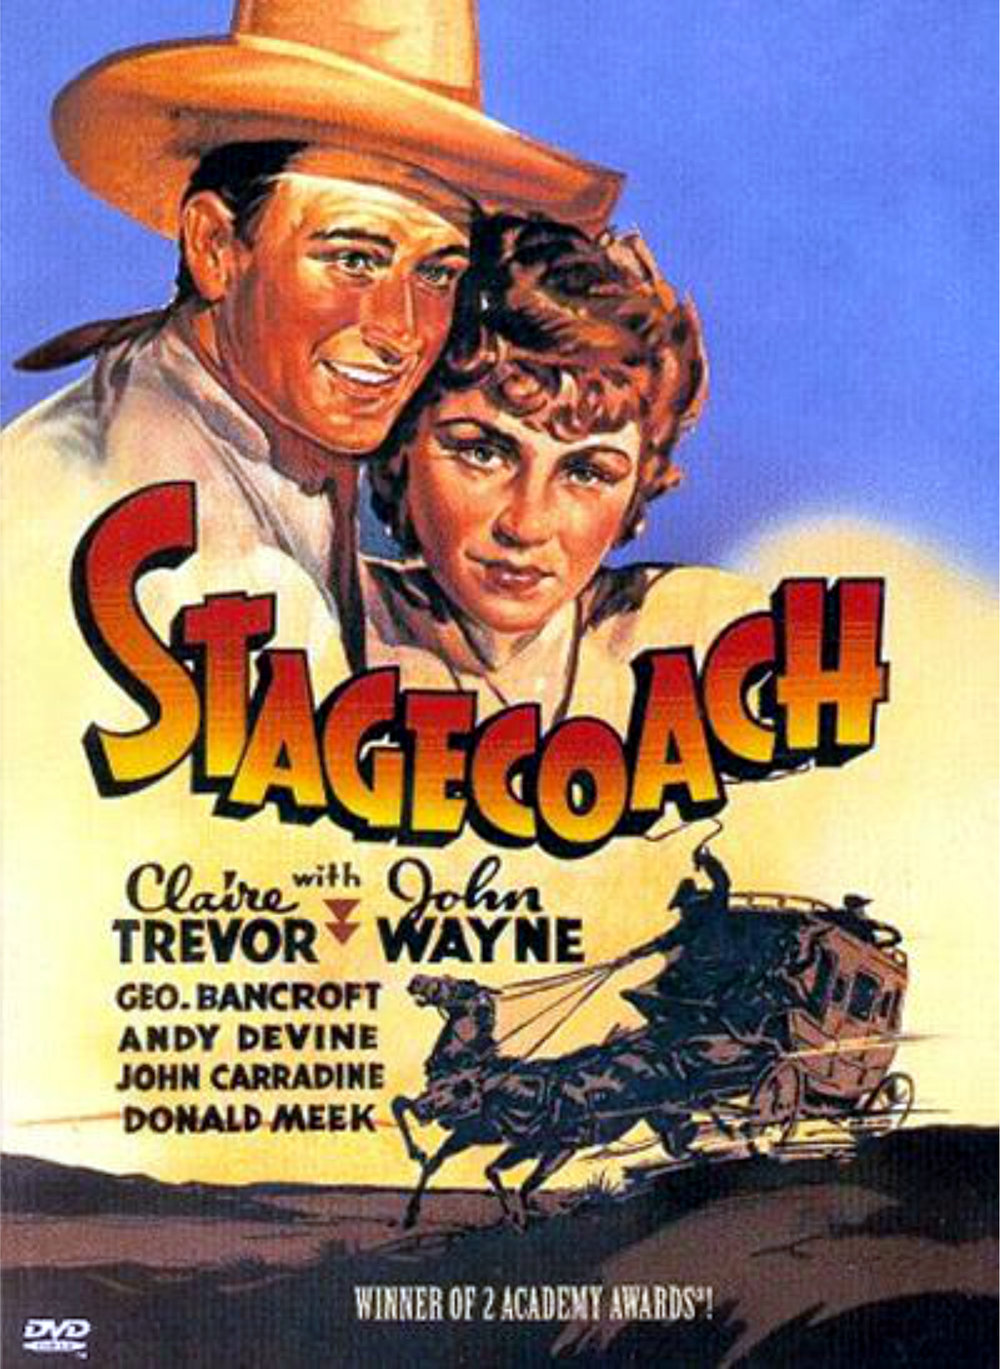 stagecoach-poster-2.jpg